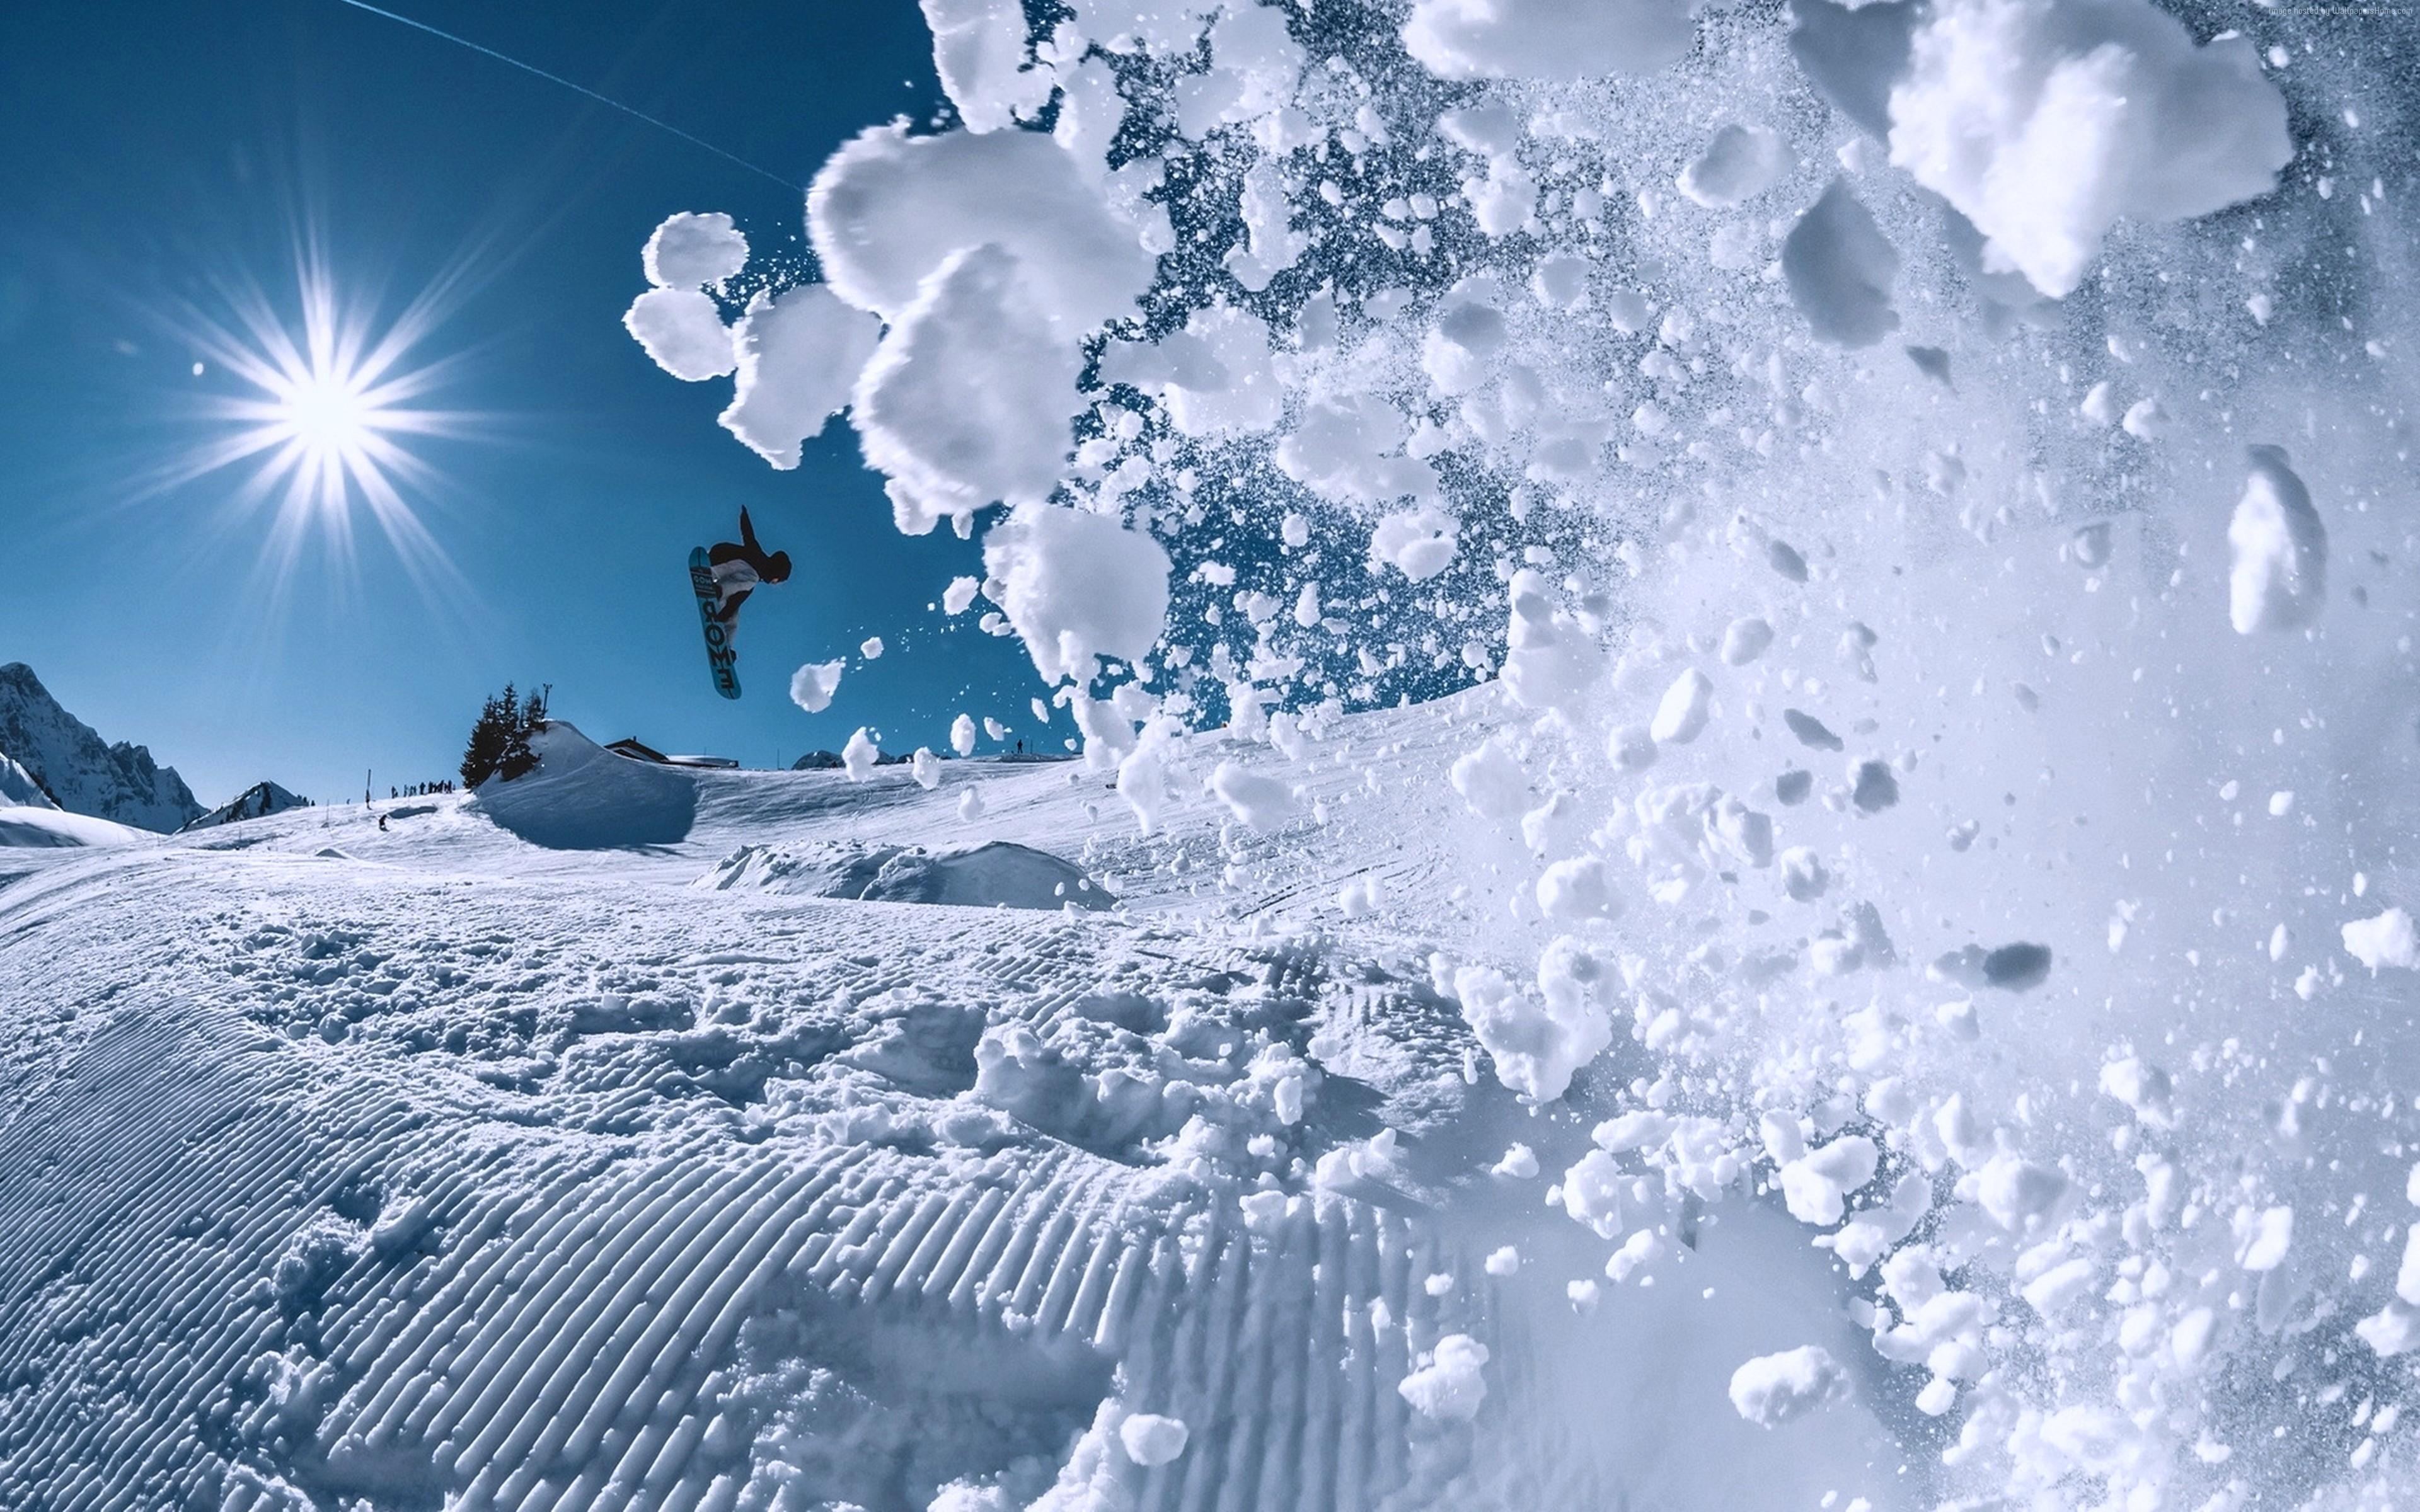 Wallpaper Snowboarding Winter Snow 4k Sport Wallpaper Download High Resolution 4k Wallpaper